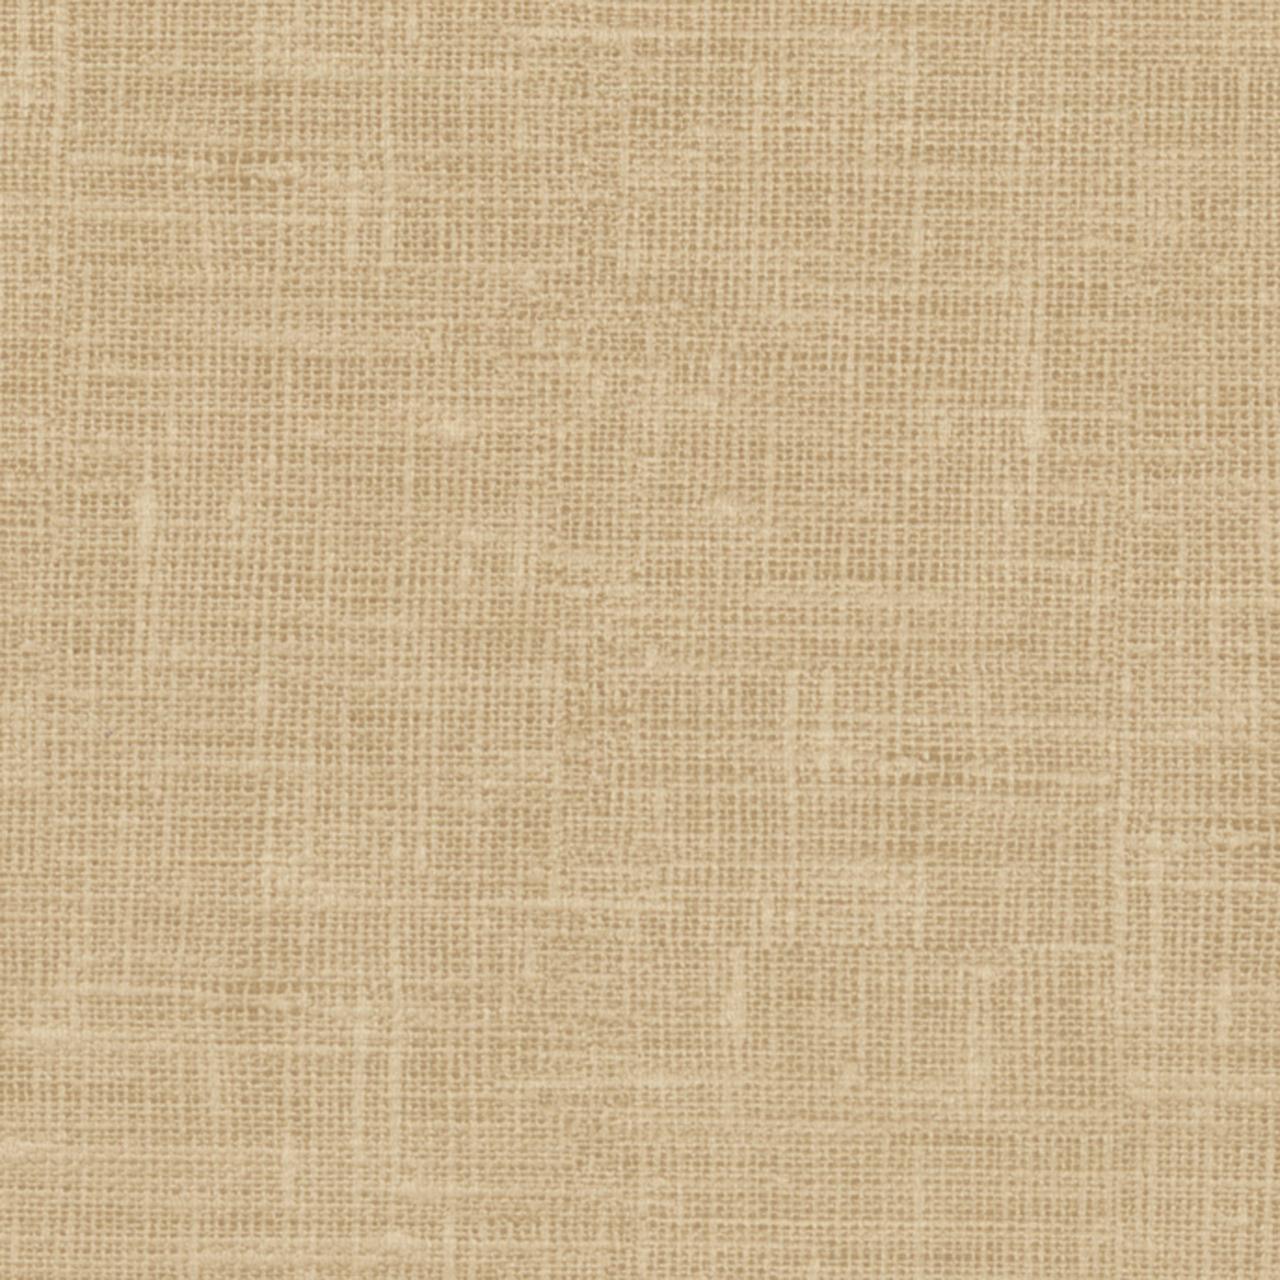 Linen Texture Wallpaper Page 1